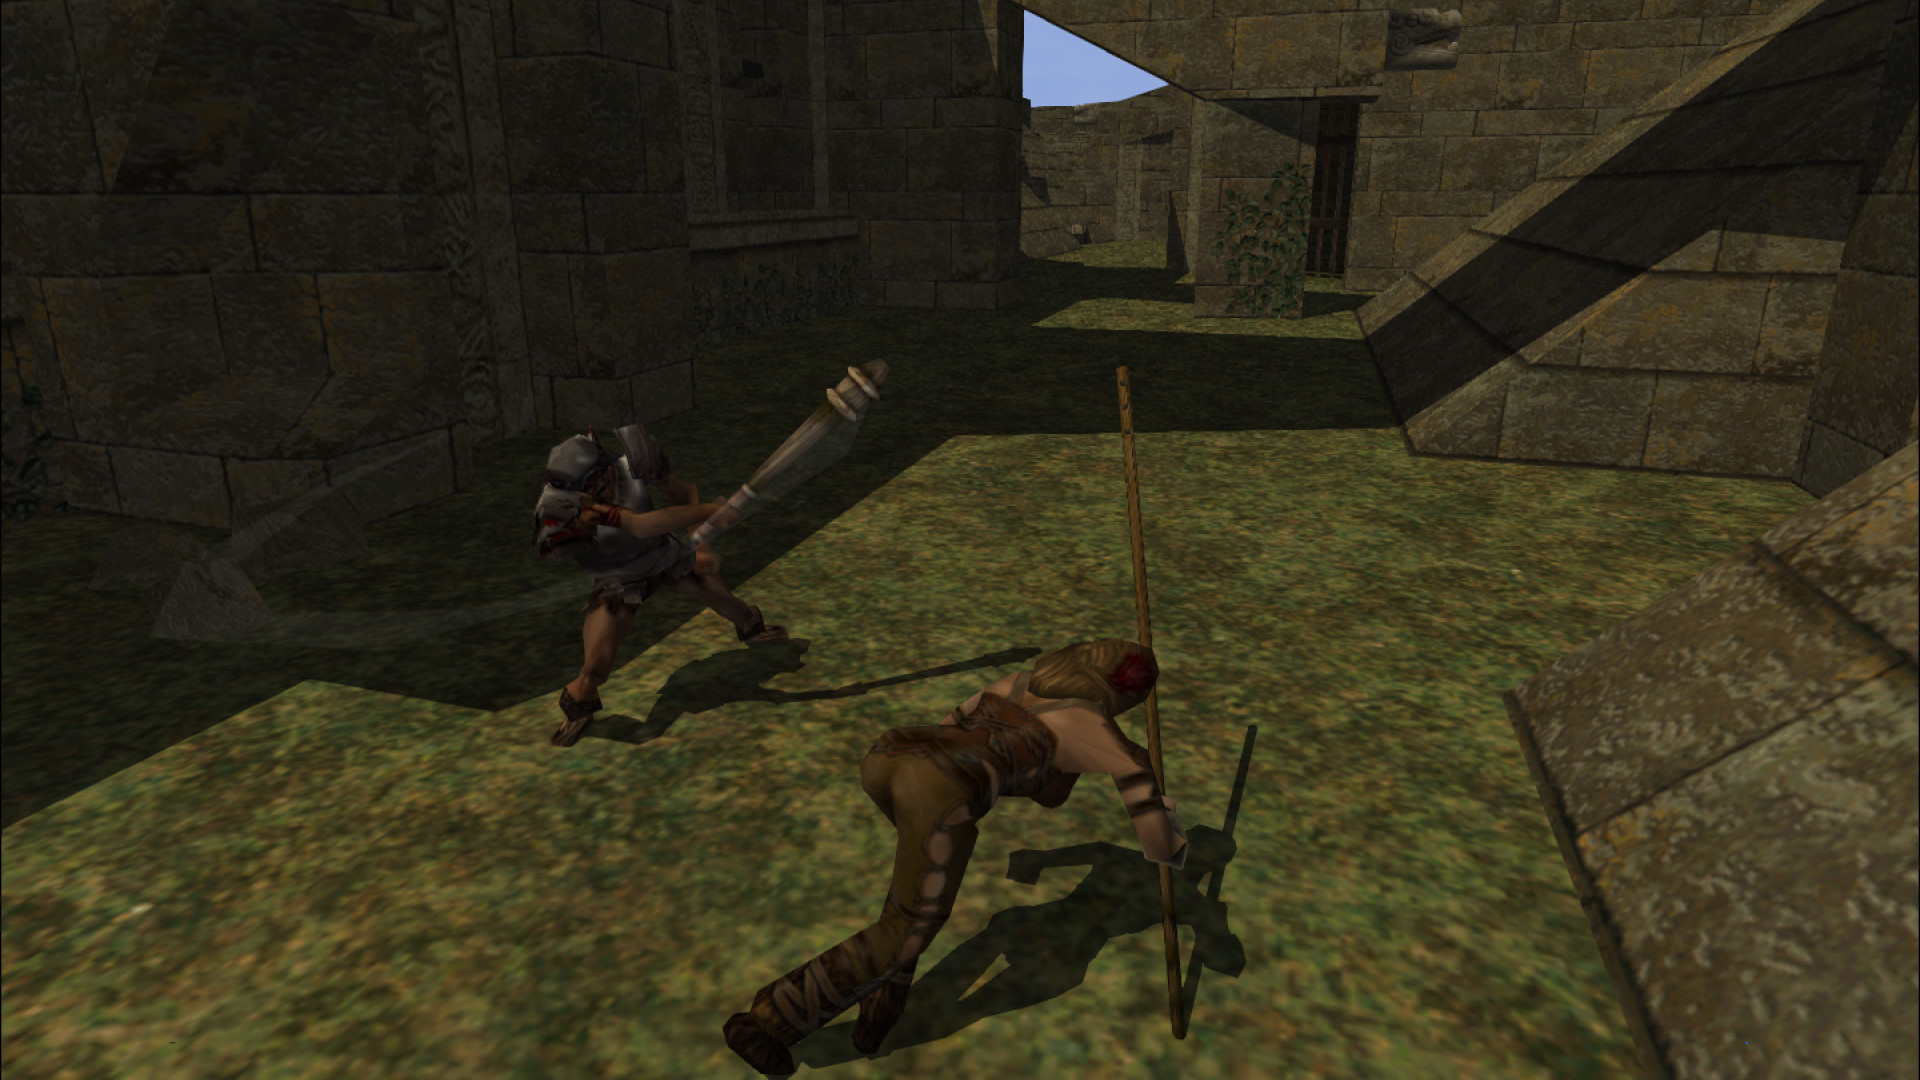 Blade of Darkness screenshot 2